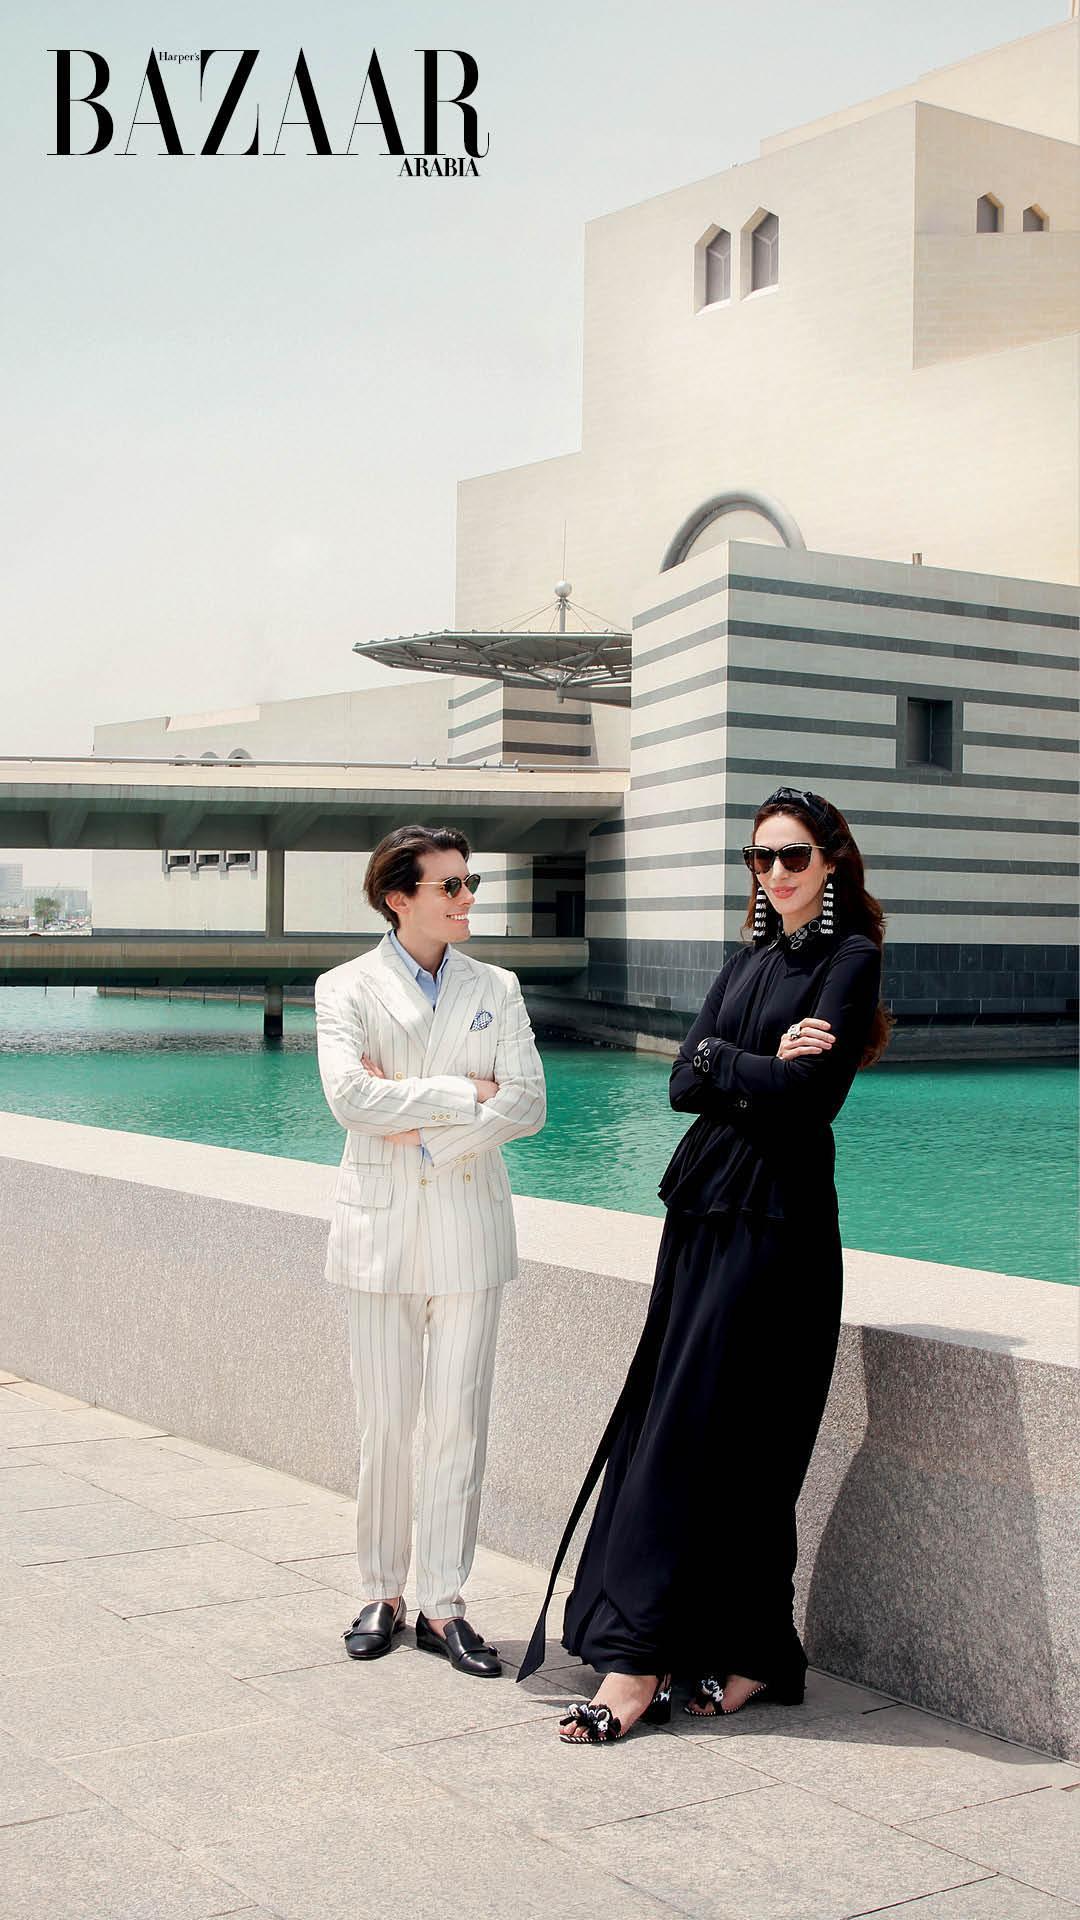 Sheikha Raya Al-Khalifa and Edgardo Osorio